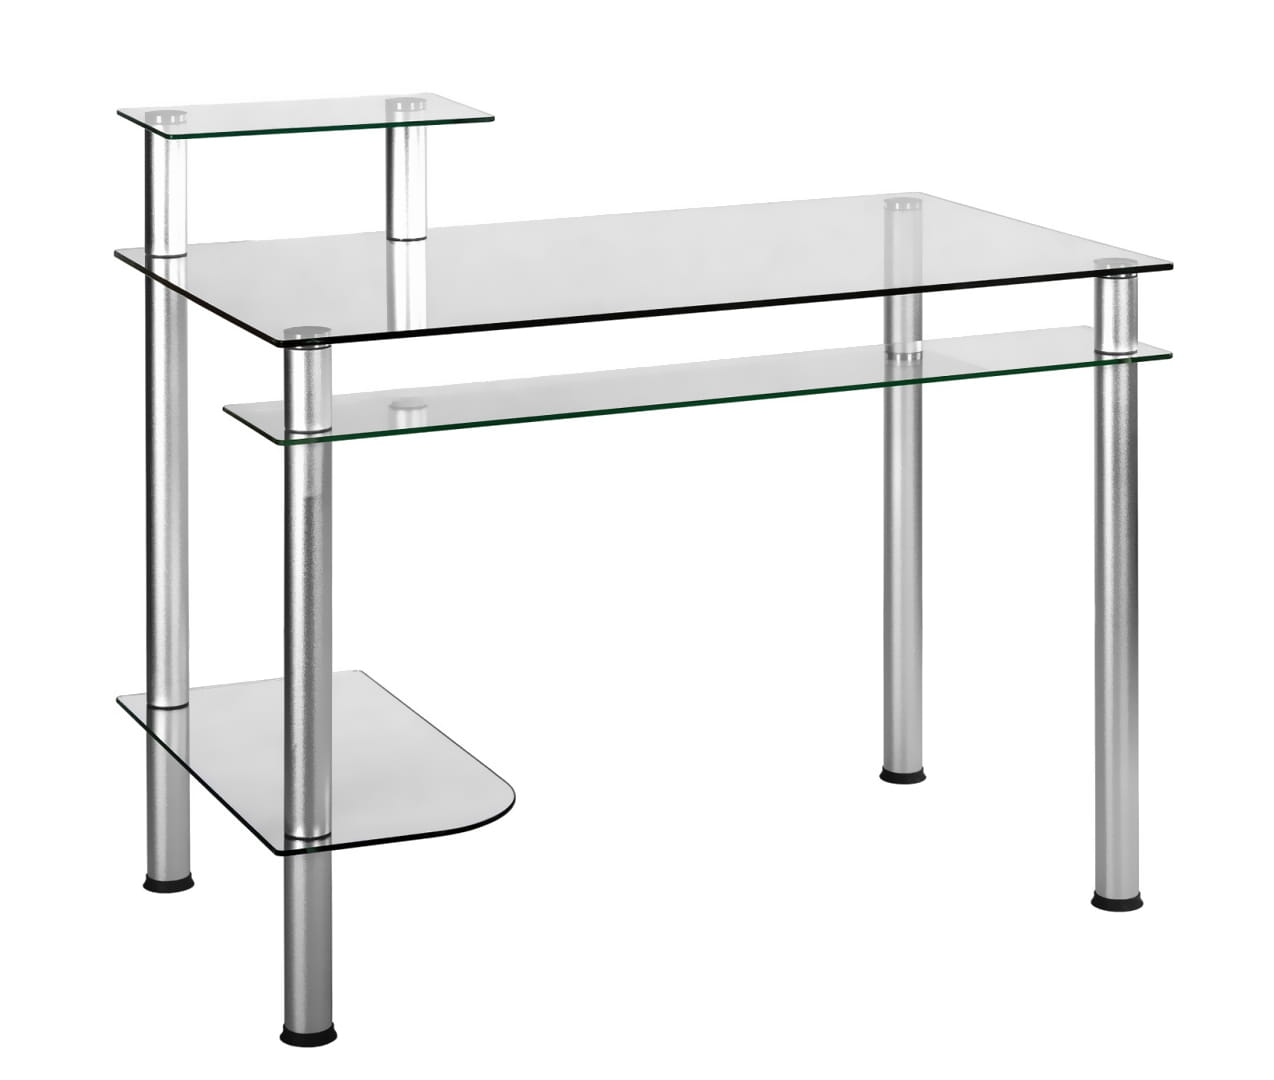 Biurko Komputerowe Szklane Pod Komputer